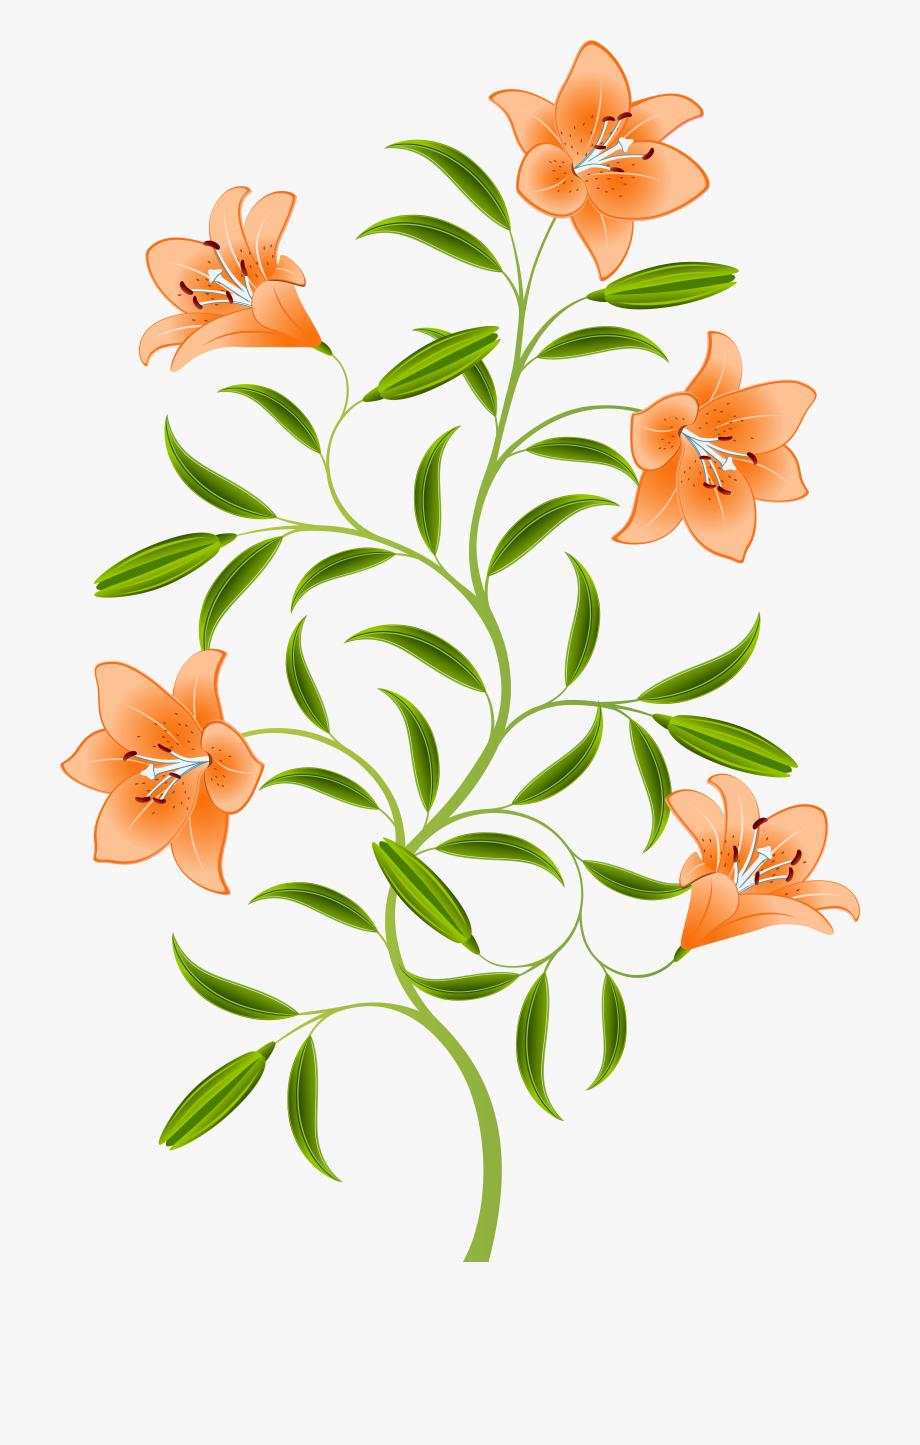 Tiger lily flower clipart clip royalty free library Orange For Free Download On Mbtskoudsalg - Tiger Lily Flower ... clip royalty free library